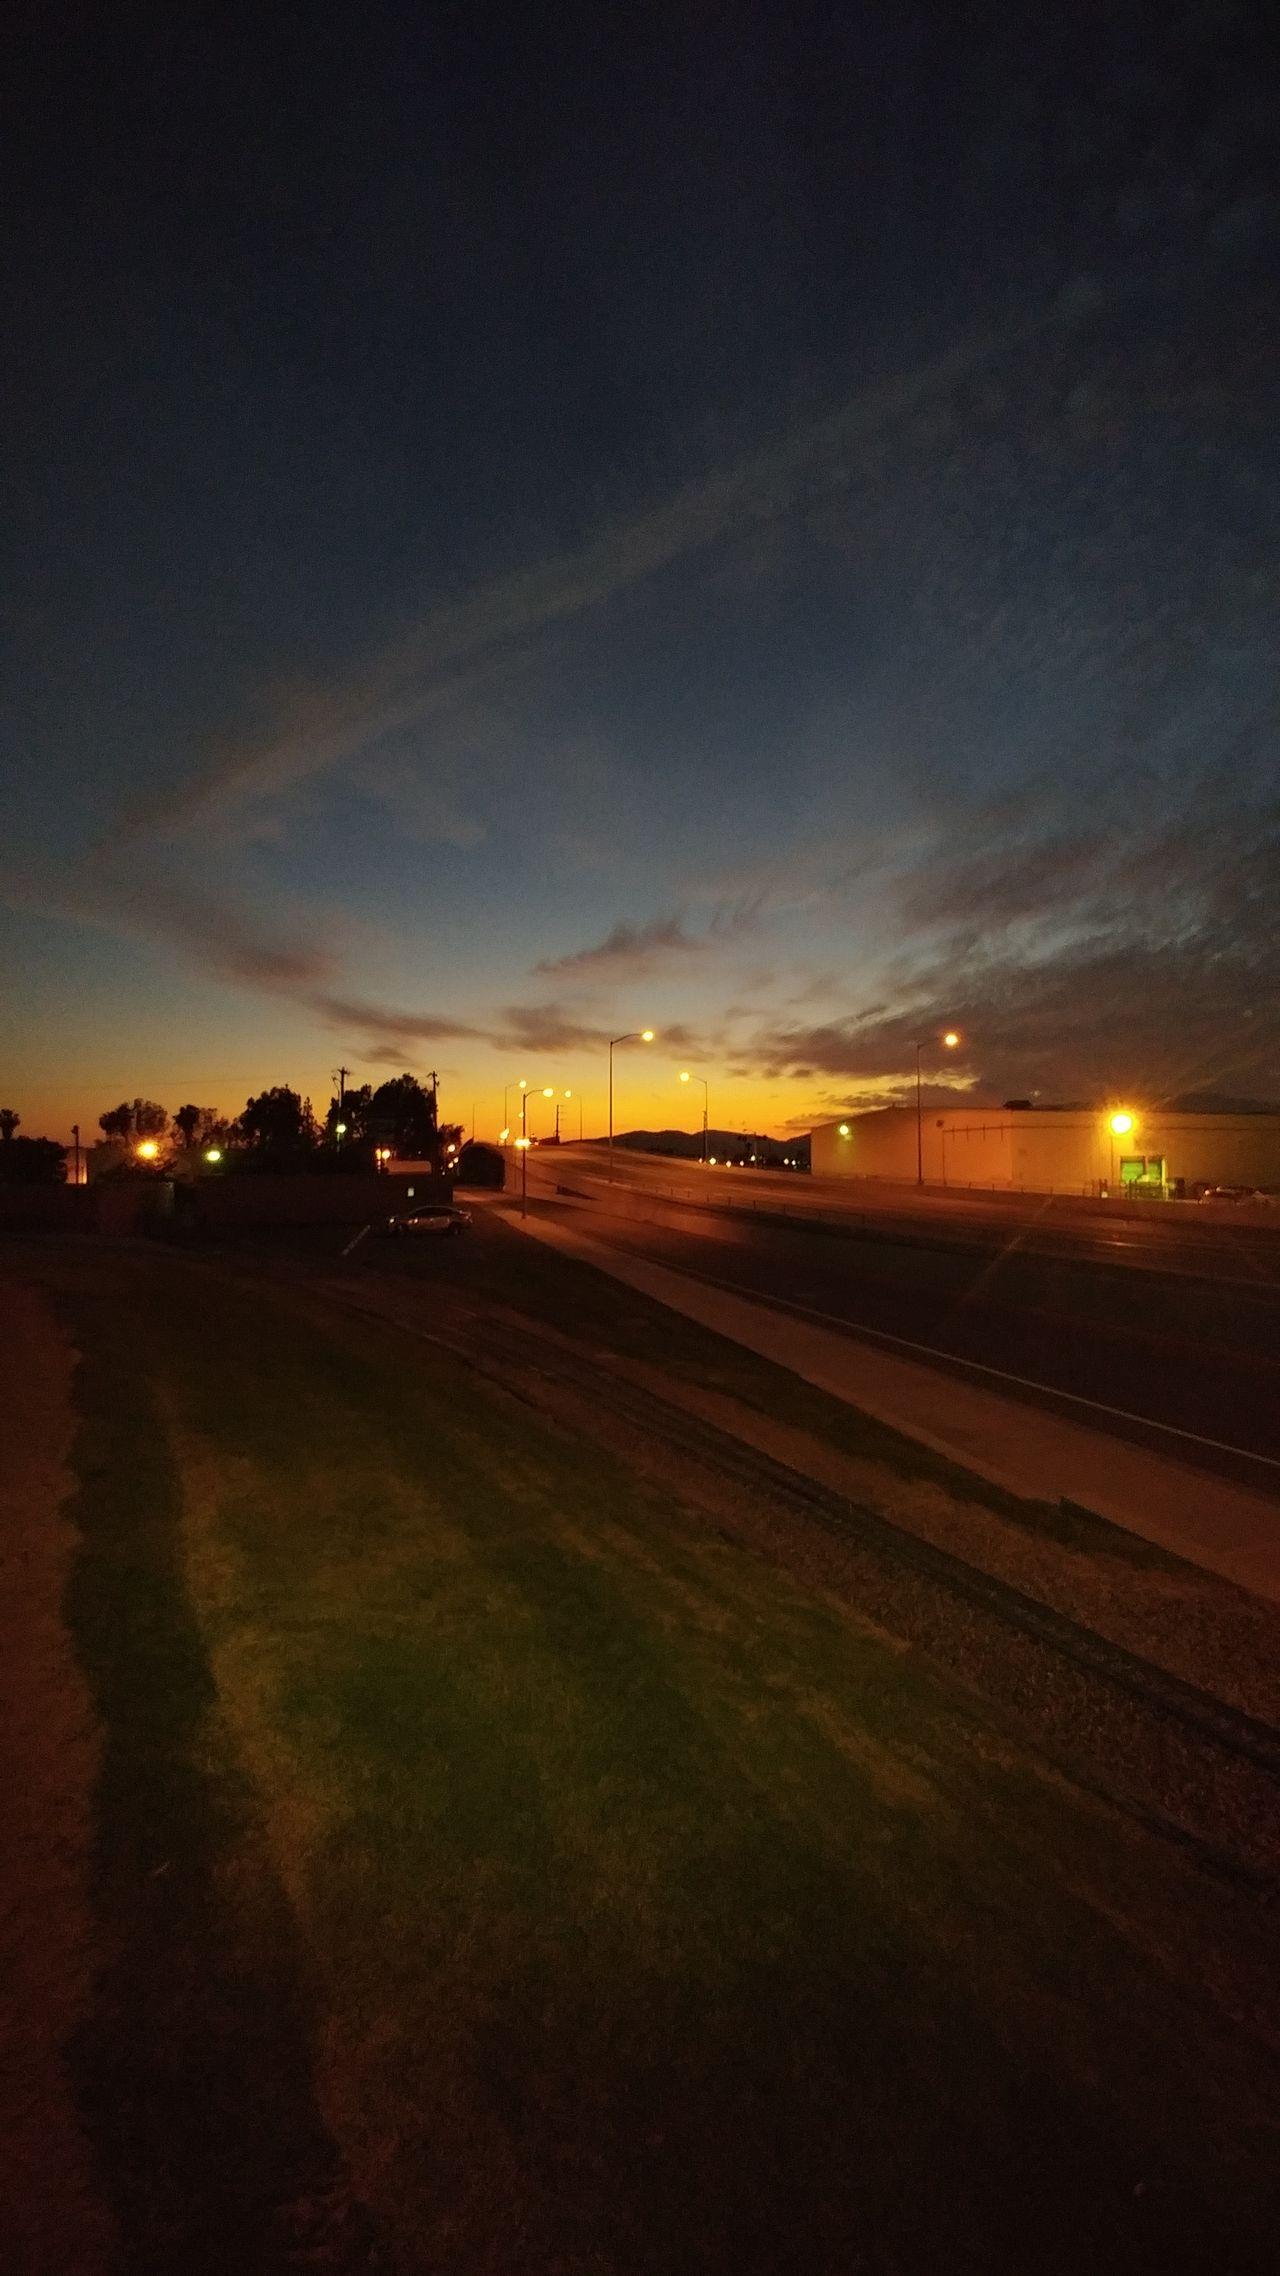 Sunset No People Dusk Illuminated Night Outdoors Cloud - Sky Nature Sky Beauty In Nature First Eyeem Photo EyeEmNewHere